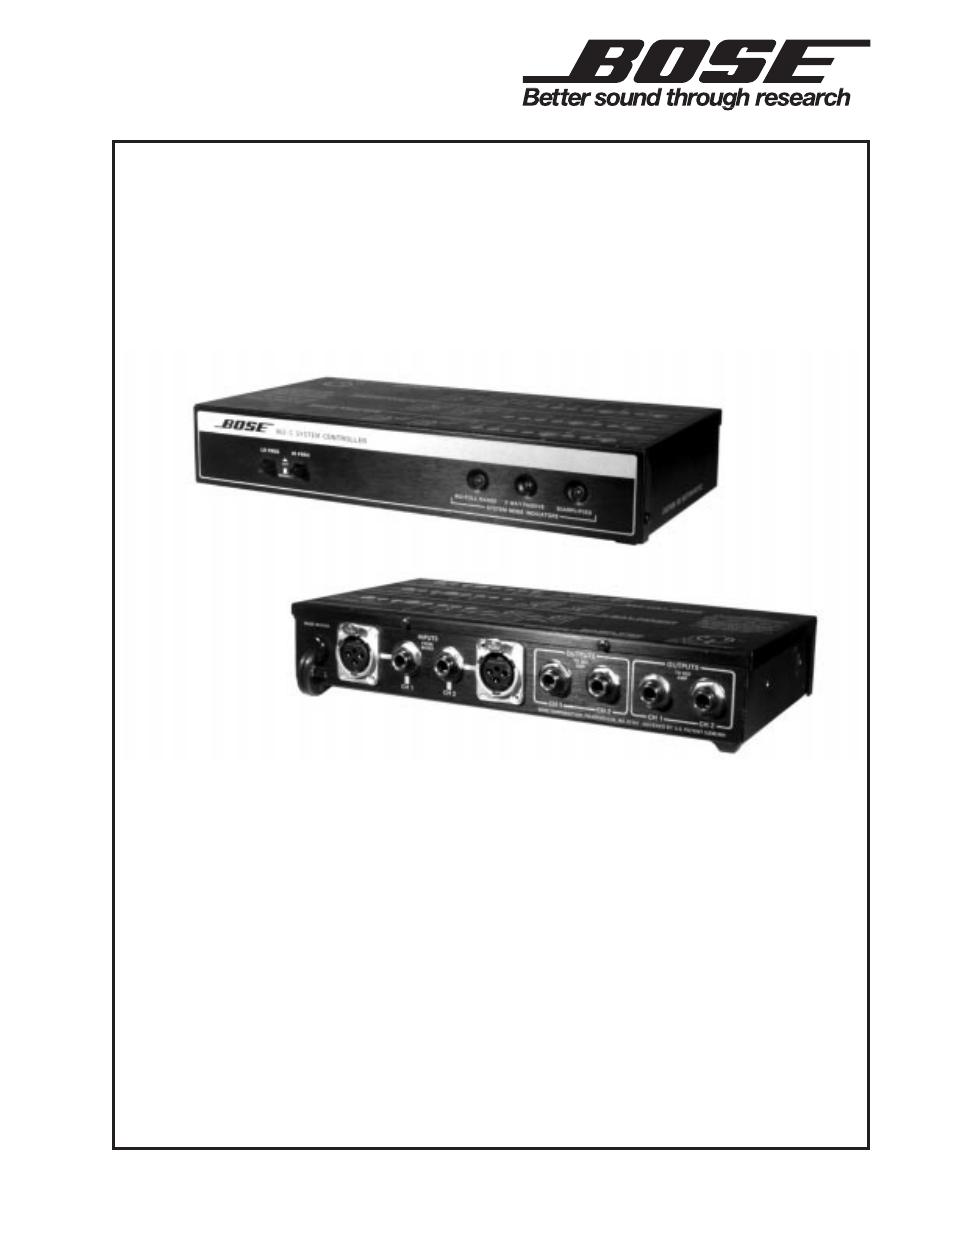 bose 802c user manual 20 pages rh manualsdir com bose 802c-ii system controller user manual bose 802c system controller manual